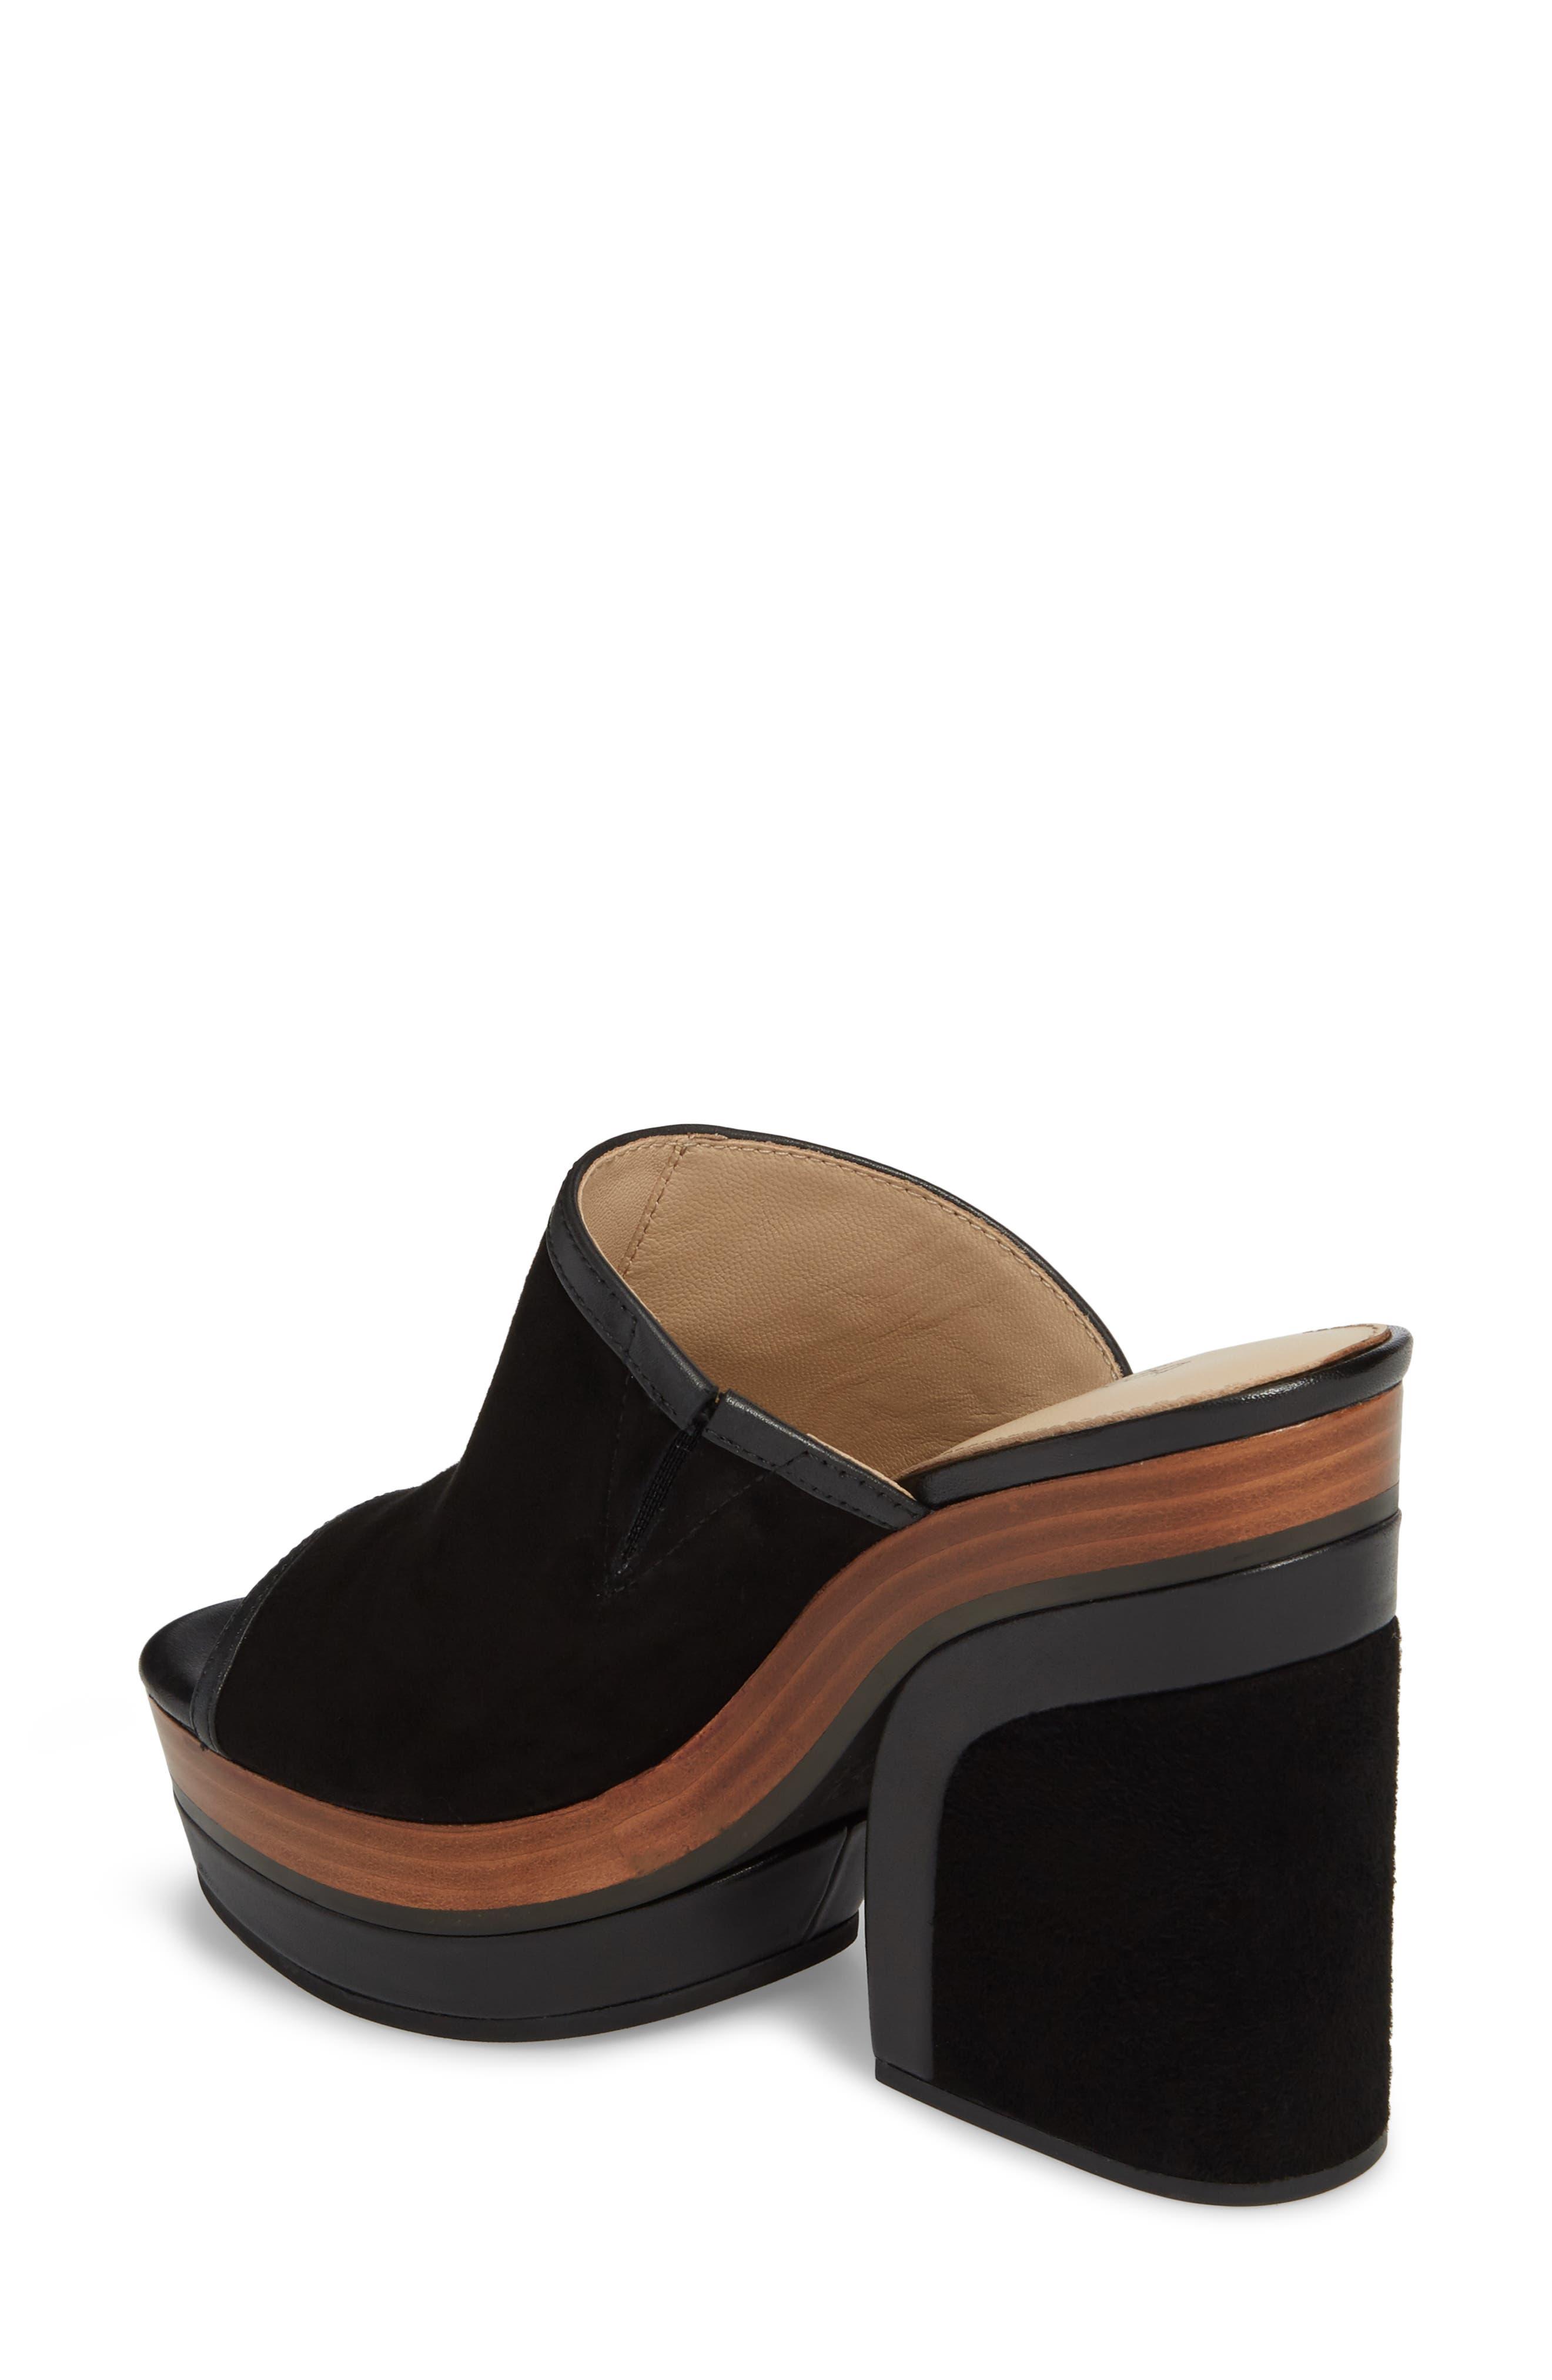 Platform Sandal,                             Alternate thumbnail 2, color,                             BLACK SUEDE